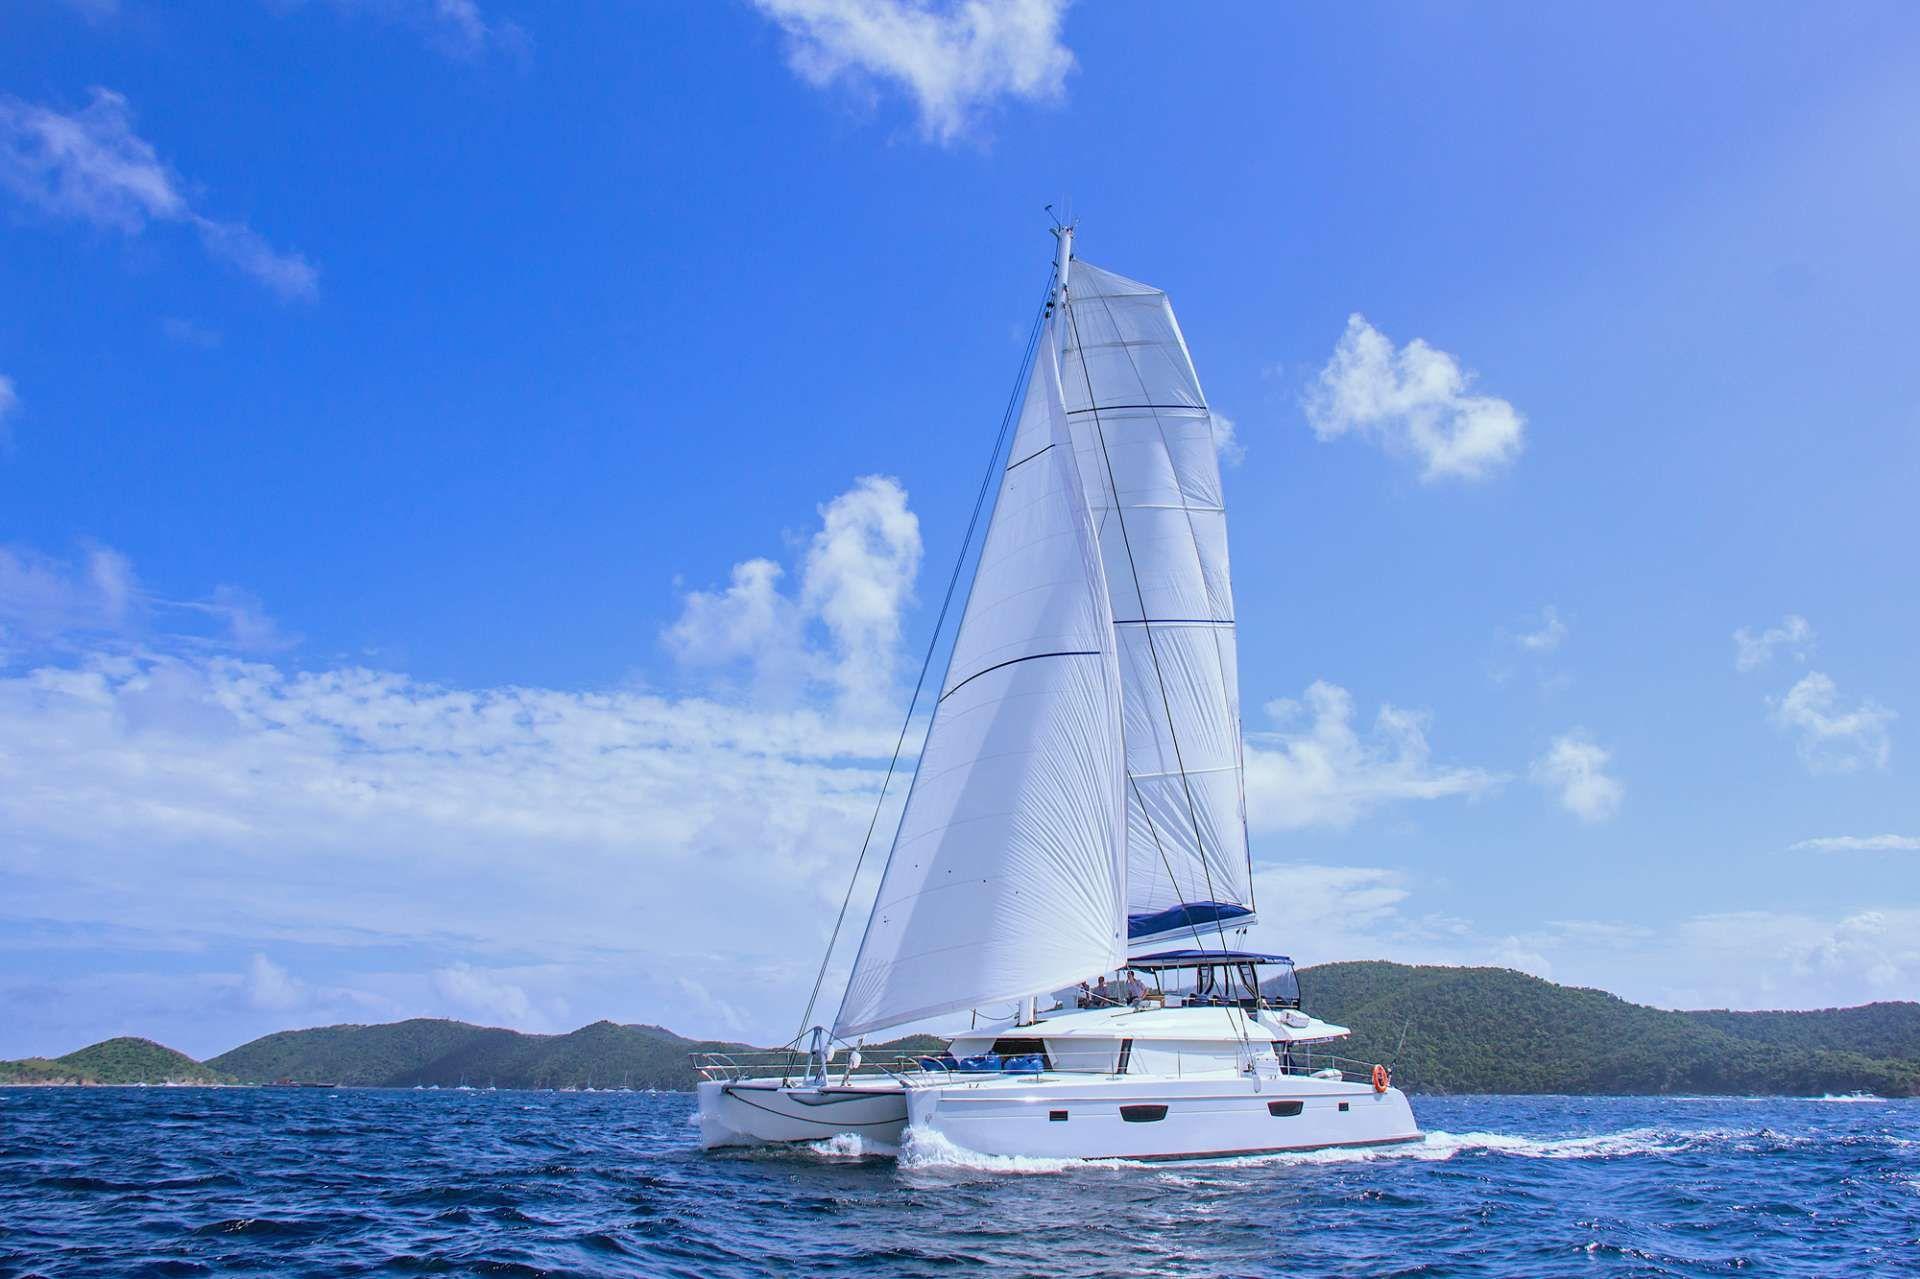 NENNE - Fountaine Pajot Victoria 67 - 5 Cabins - BVI - Tortola - Virgin Gorda - Grenadines